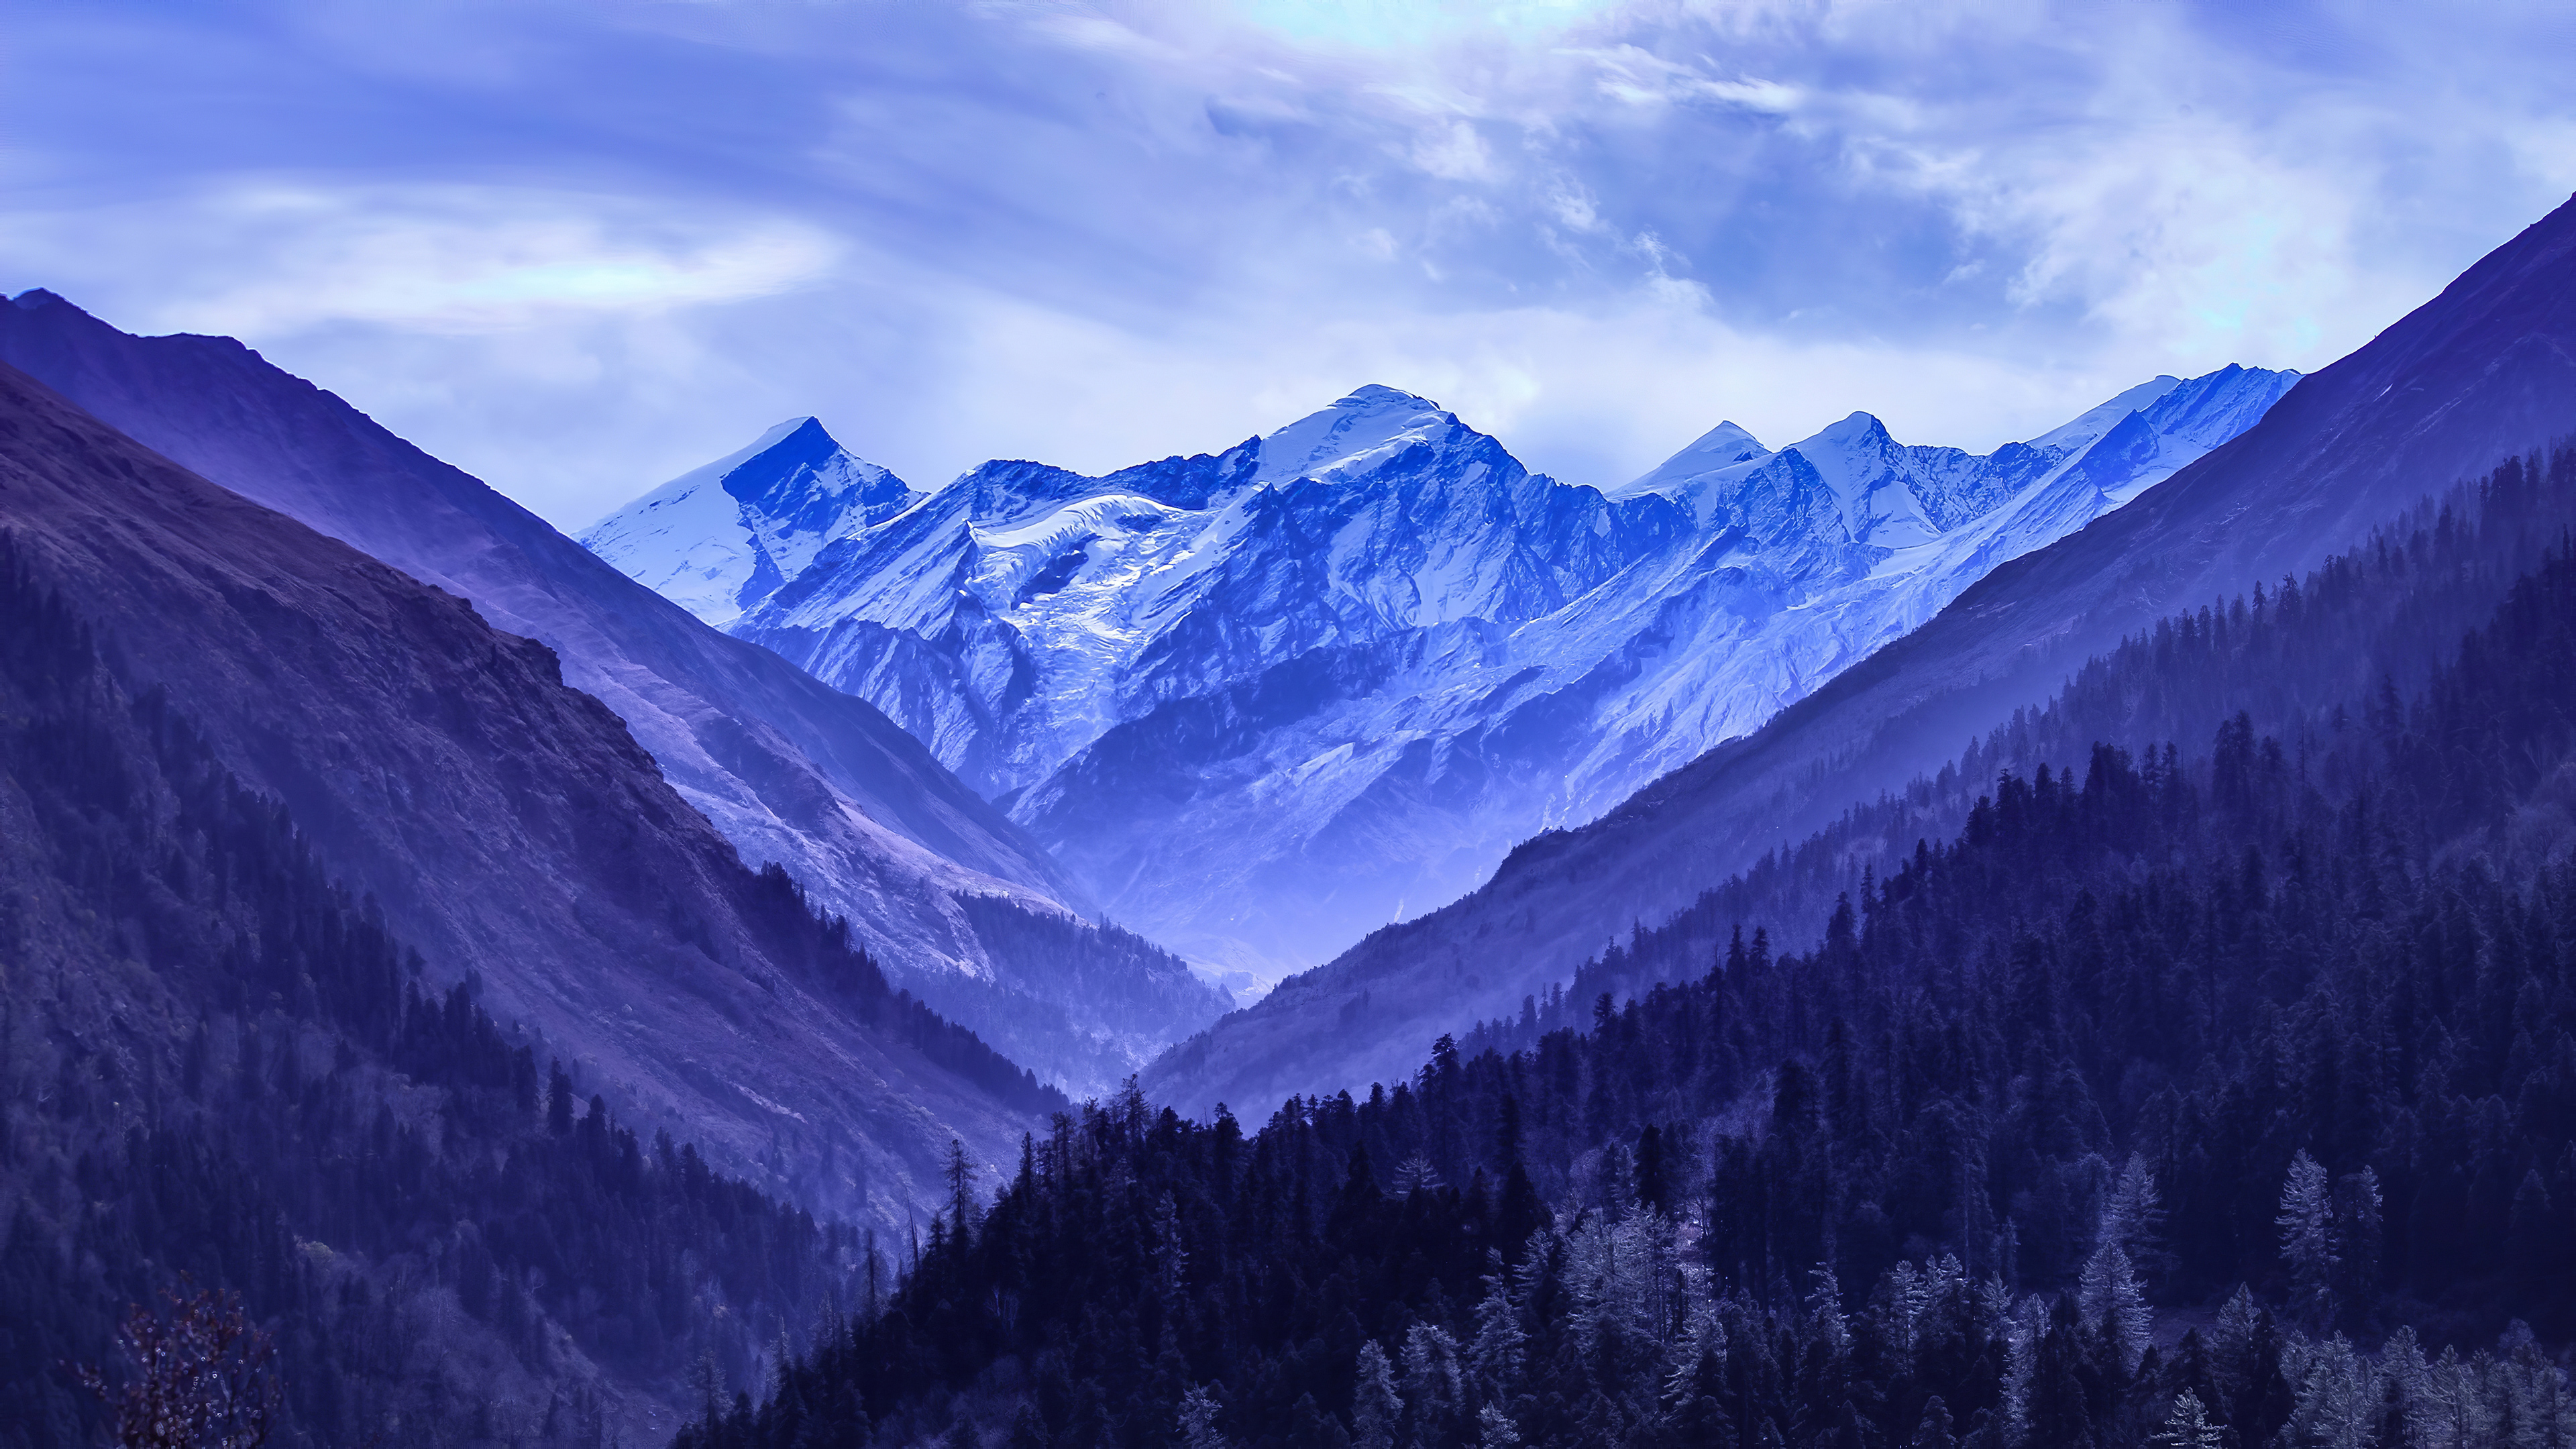 snowy blue mountains 1574937645 - Snowy Blue Mountains -